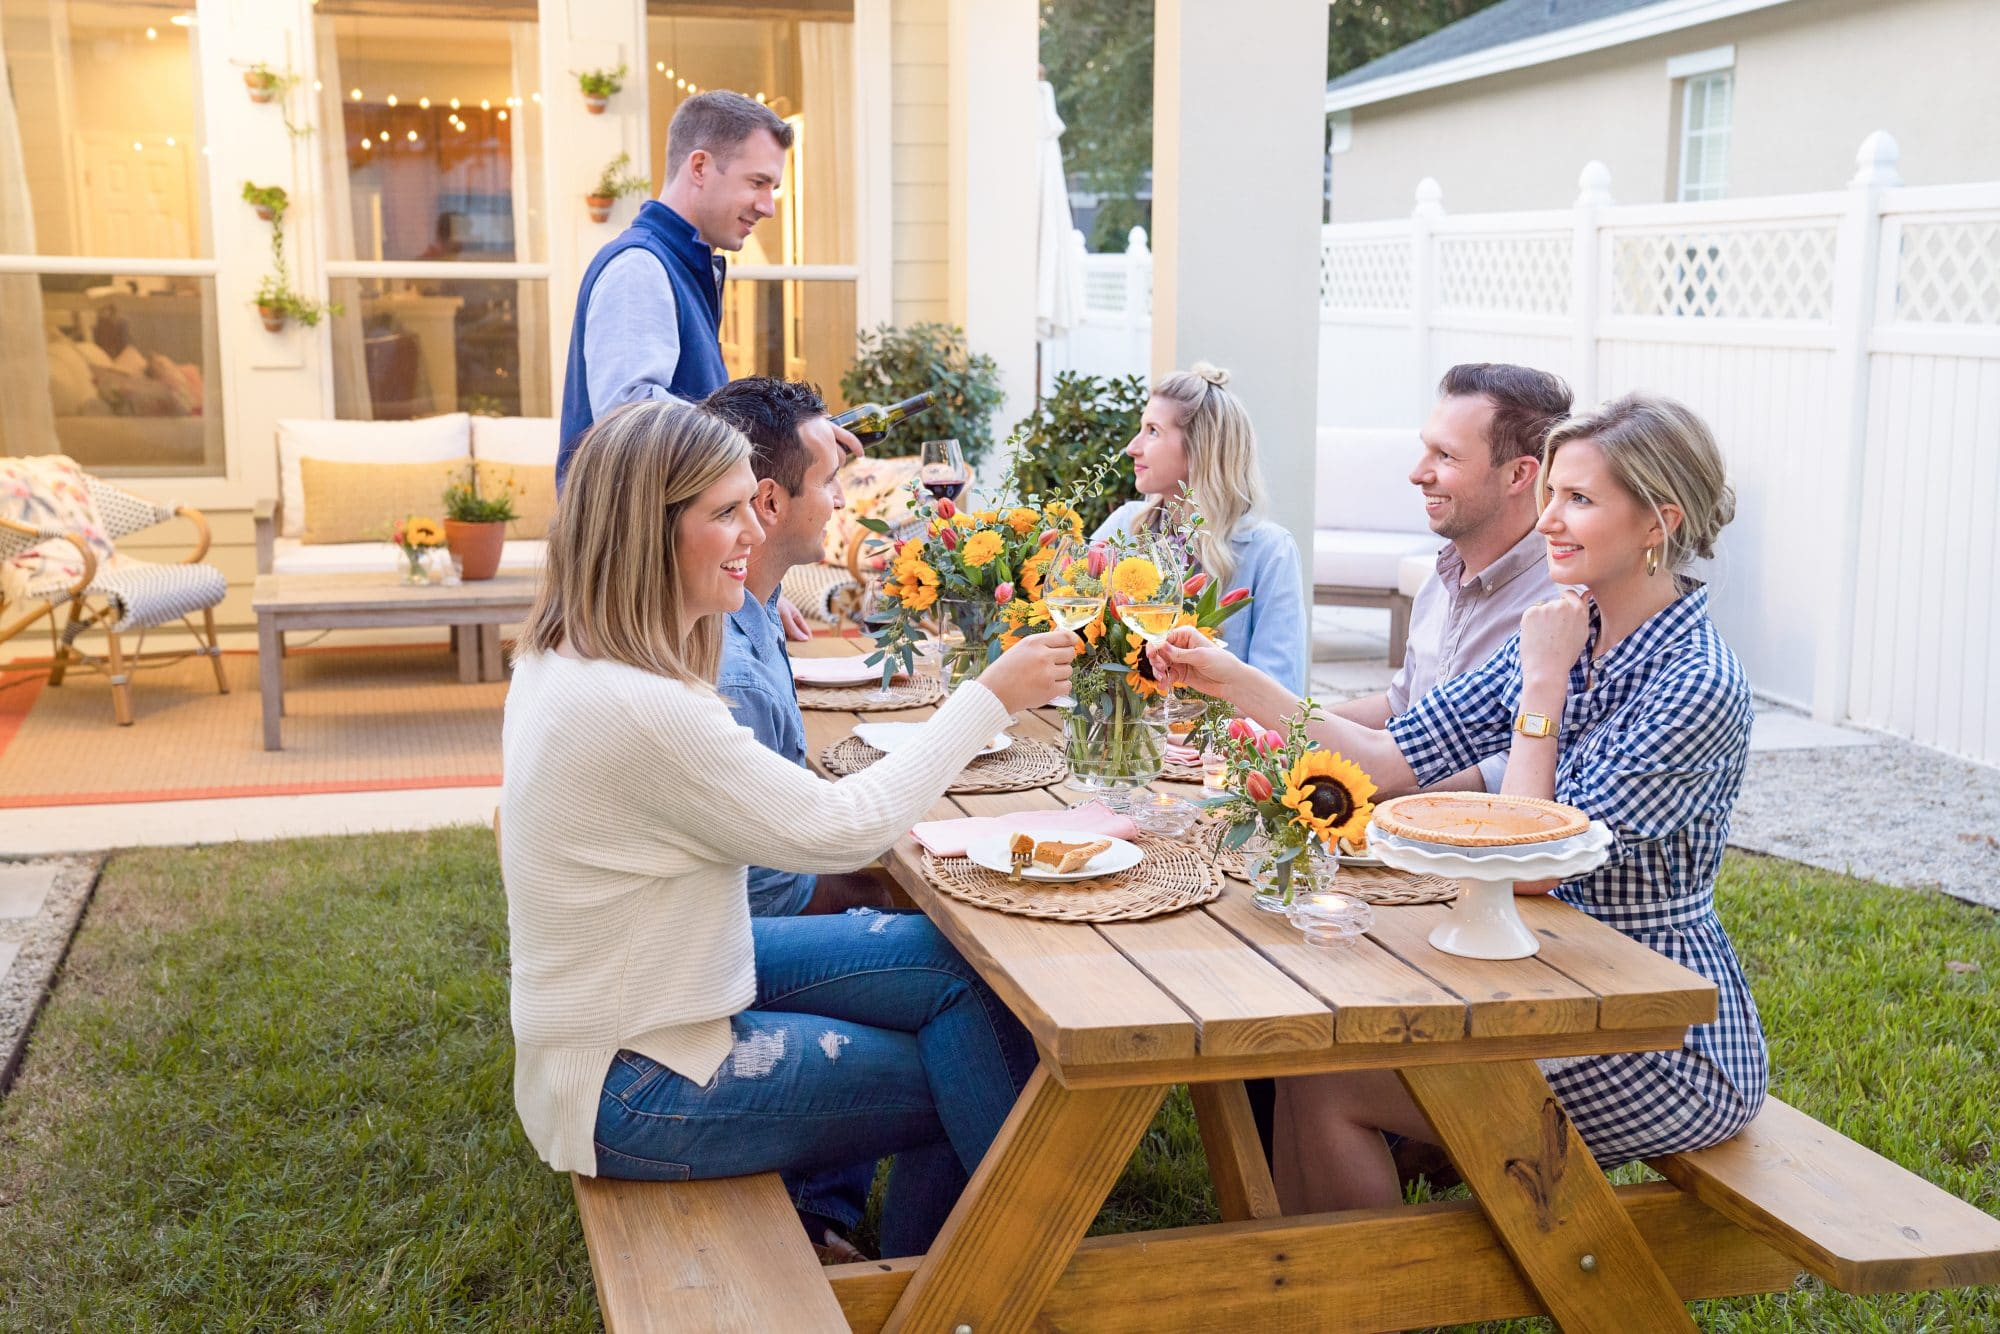 Fall Backyard Dinner With Friends v   www.ashleybrookedesigns.com